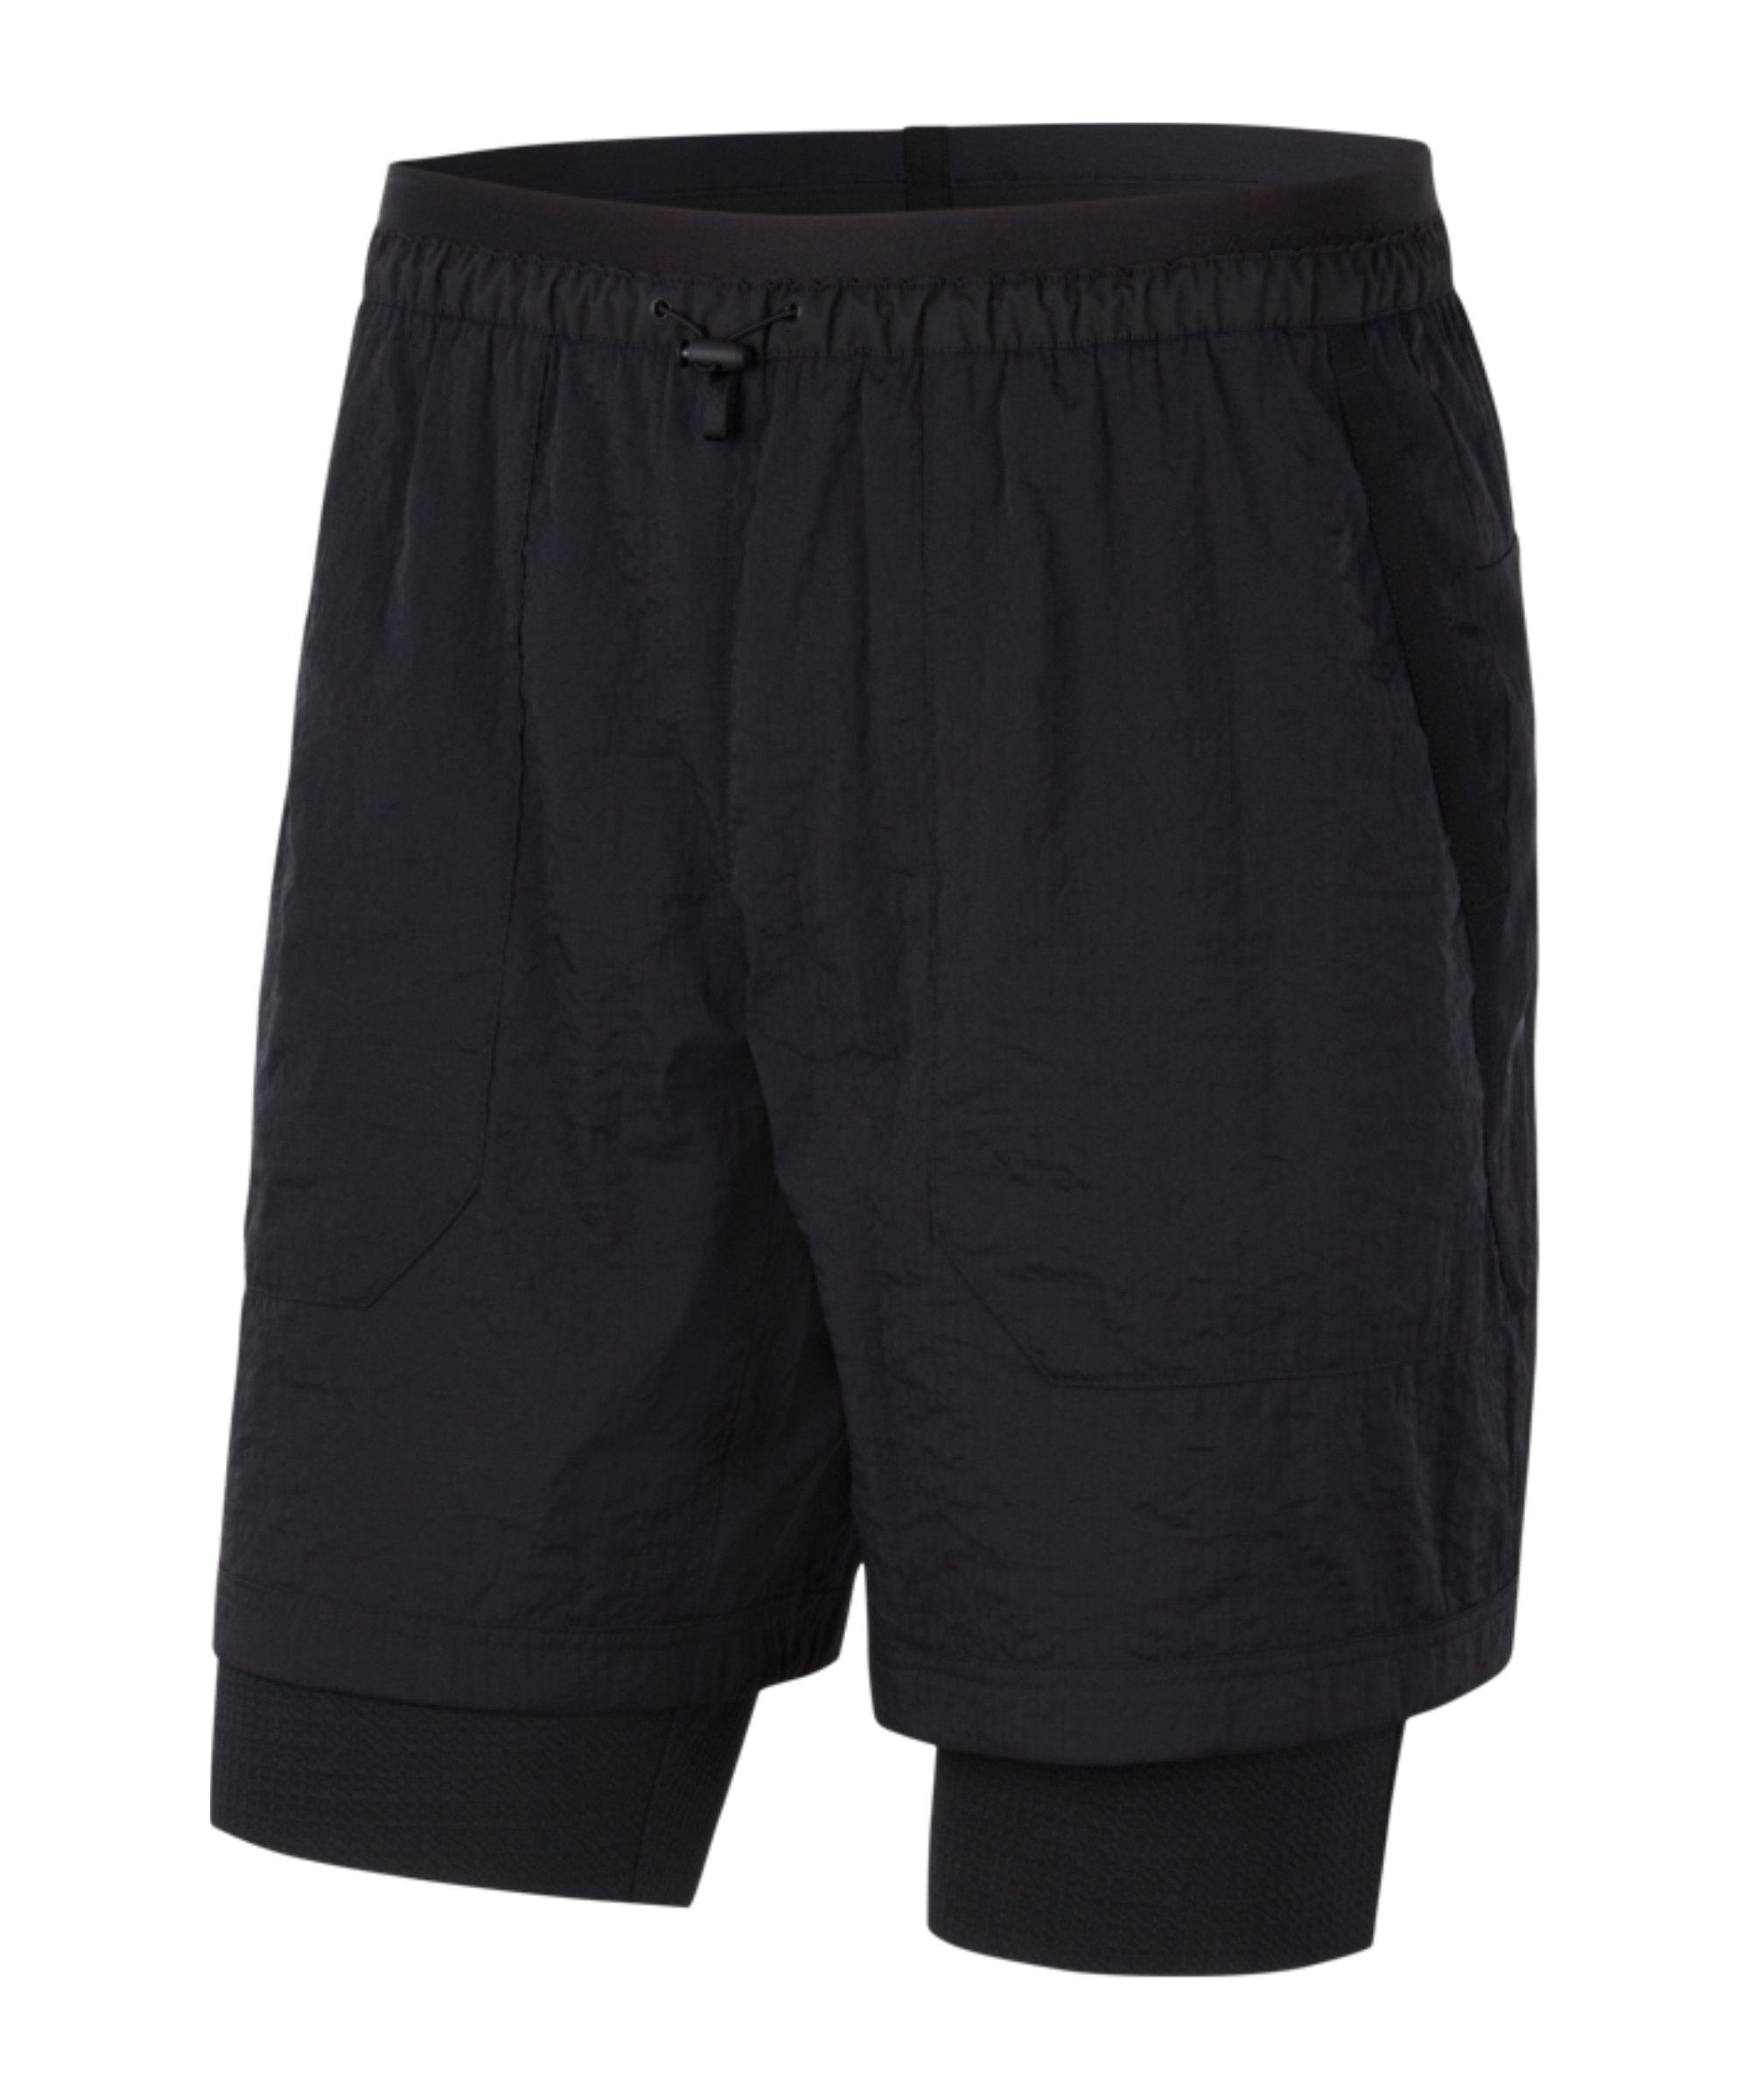 Nike Tech Pack Woven Short Schwarz F010 - schwarz